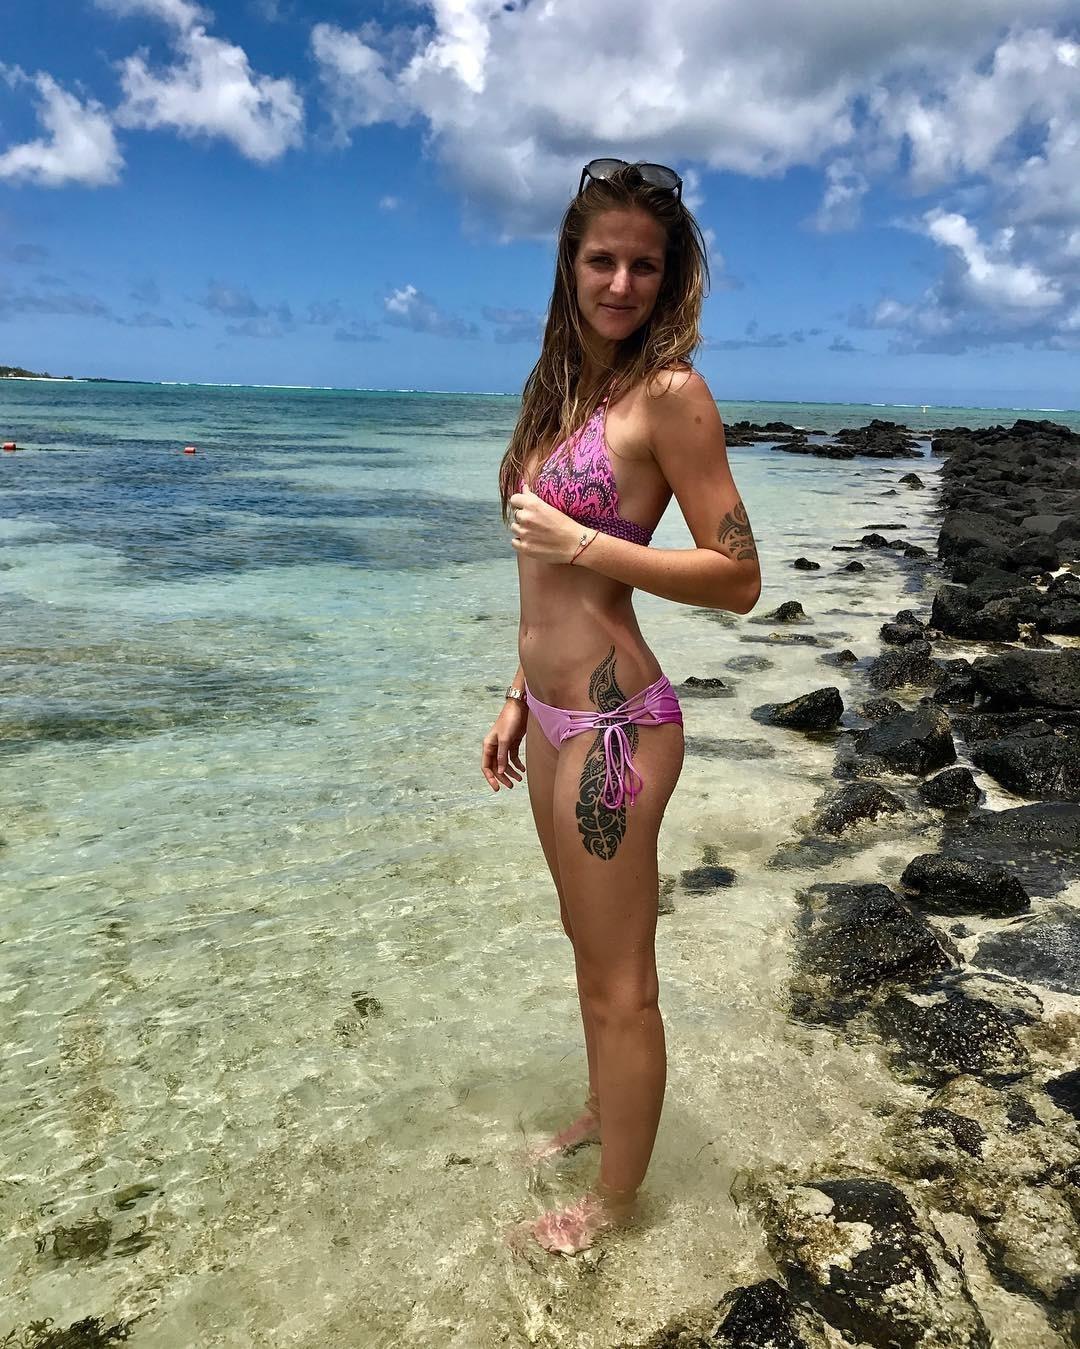 Karolina Pliskova   Pictures With a View